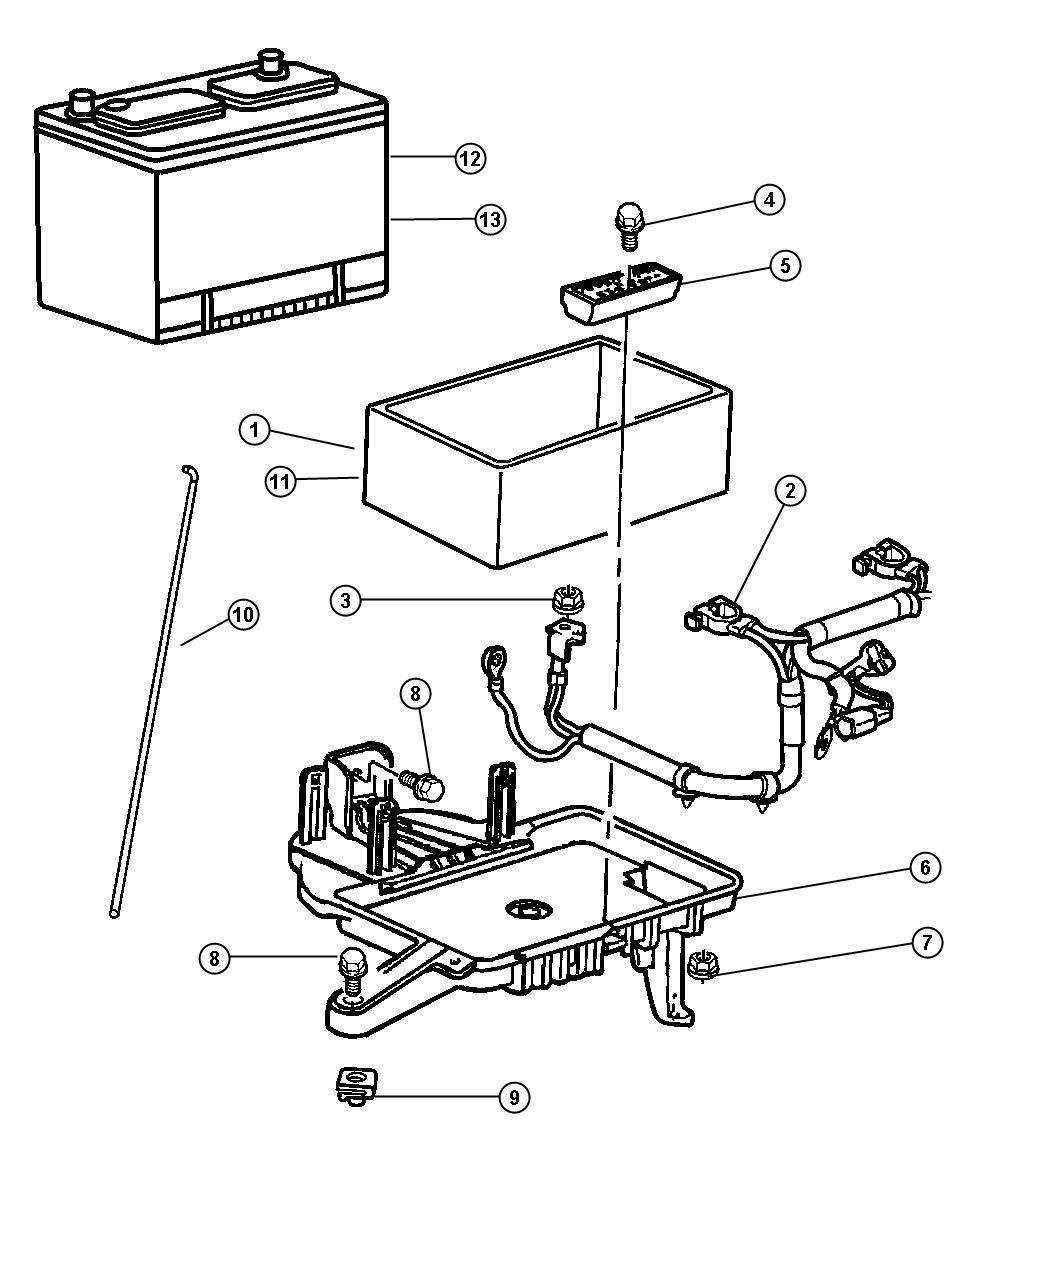 tags: #prestolite alternator wiring diagram 8rg2043#leece neville alternator  model a0012824lc wiring#powerline alternator wiring diagram#prestolite